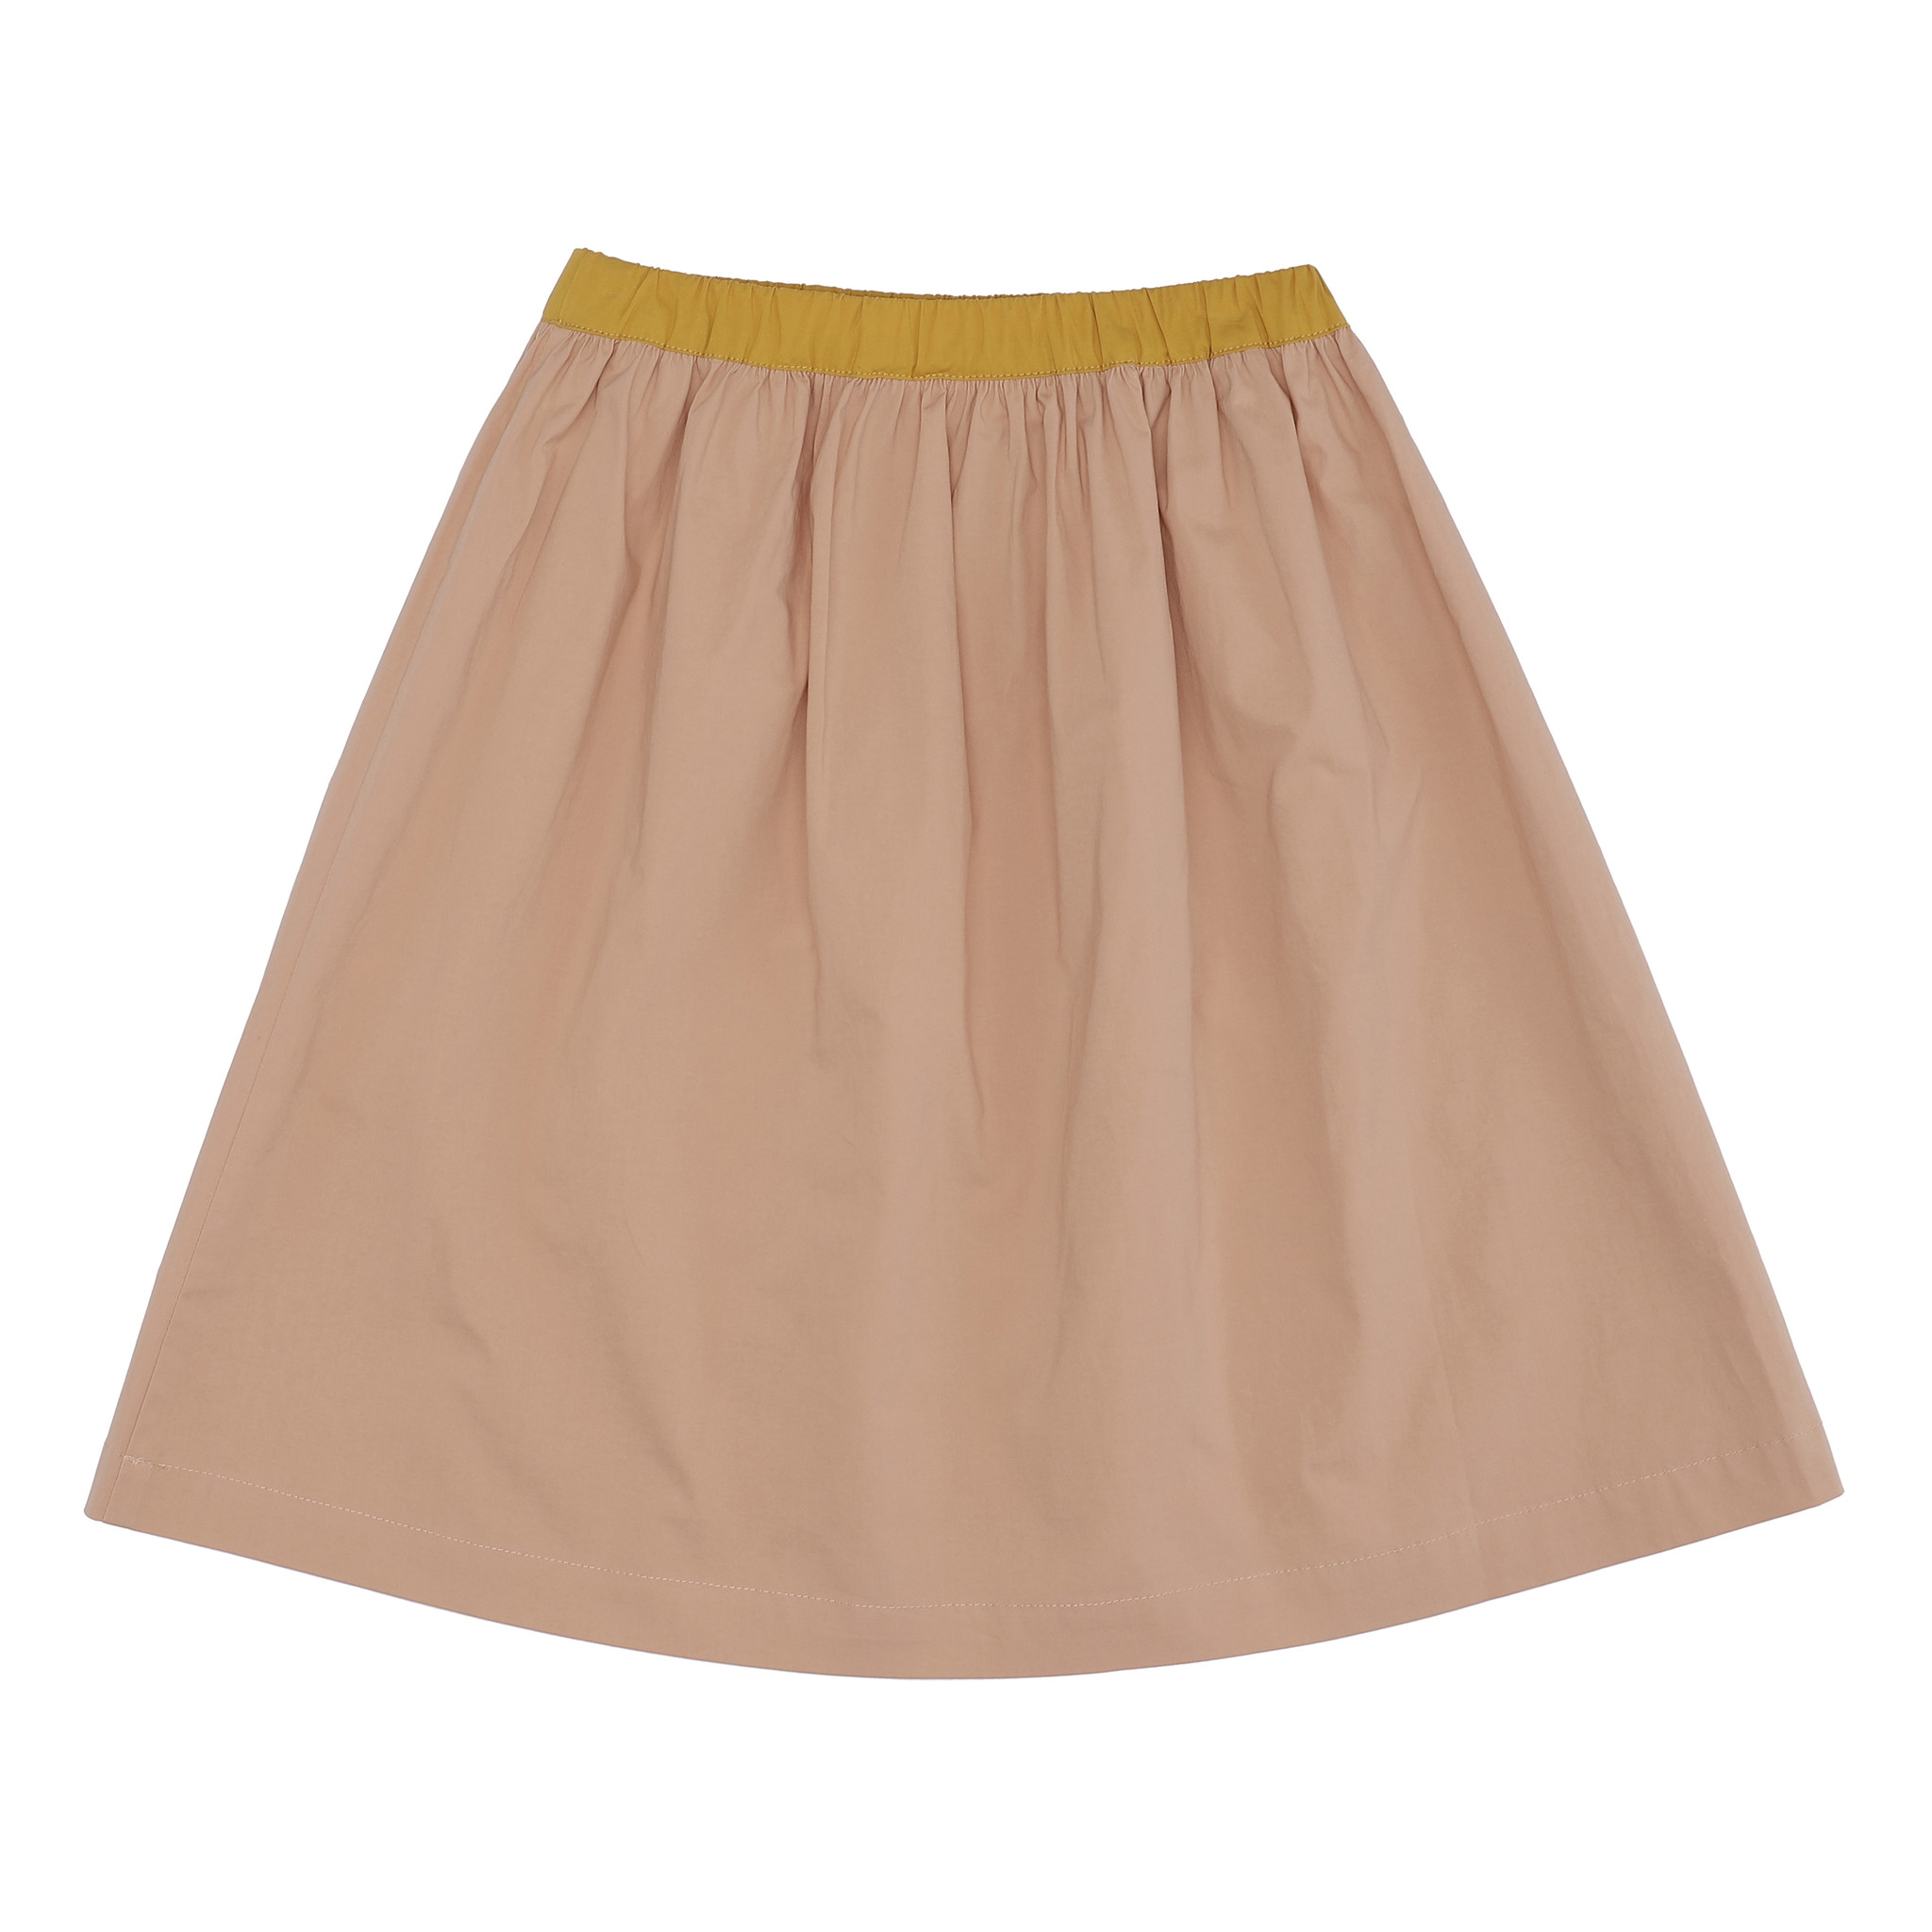 Dixie skirt - Windy Block SS20-3